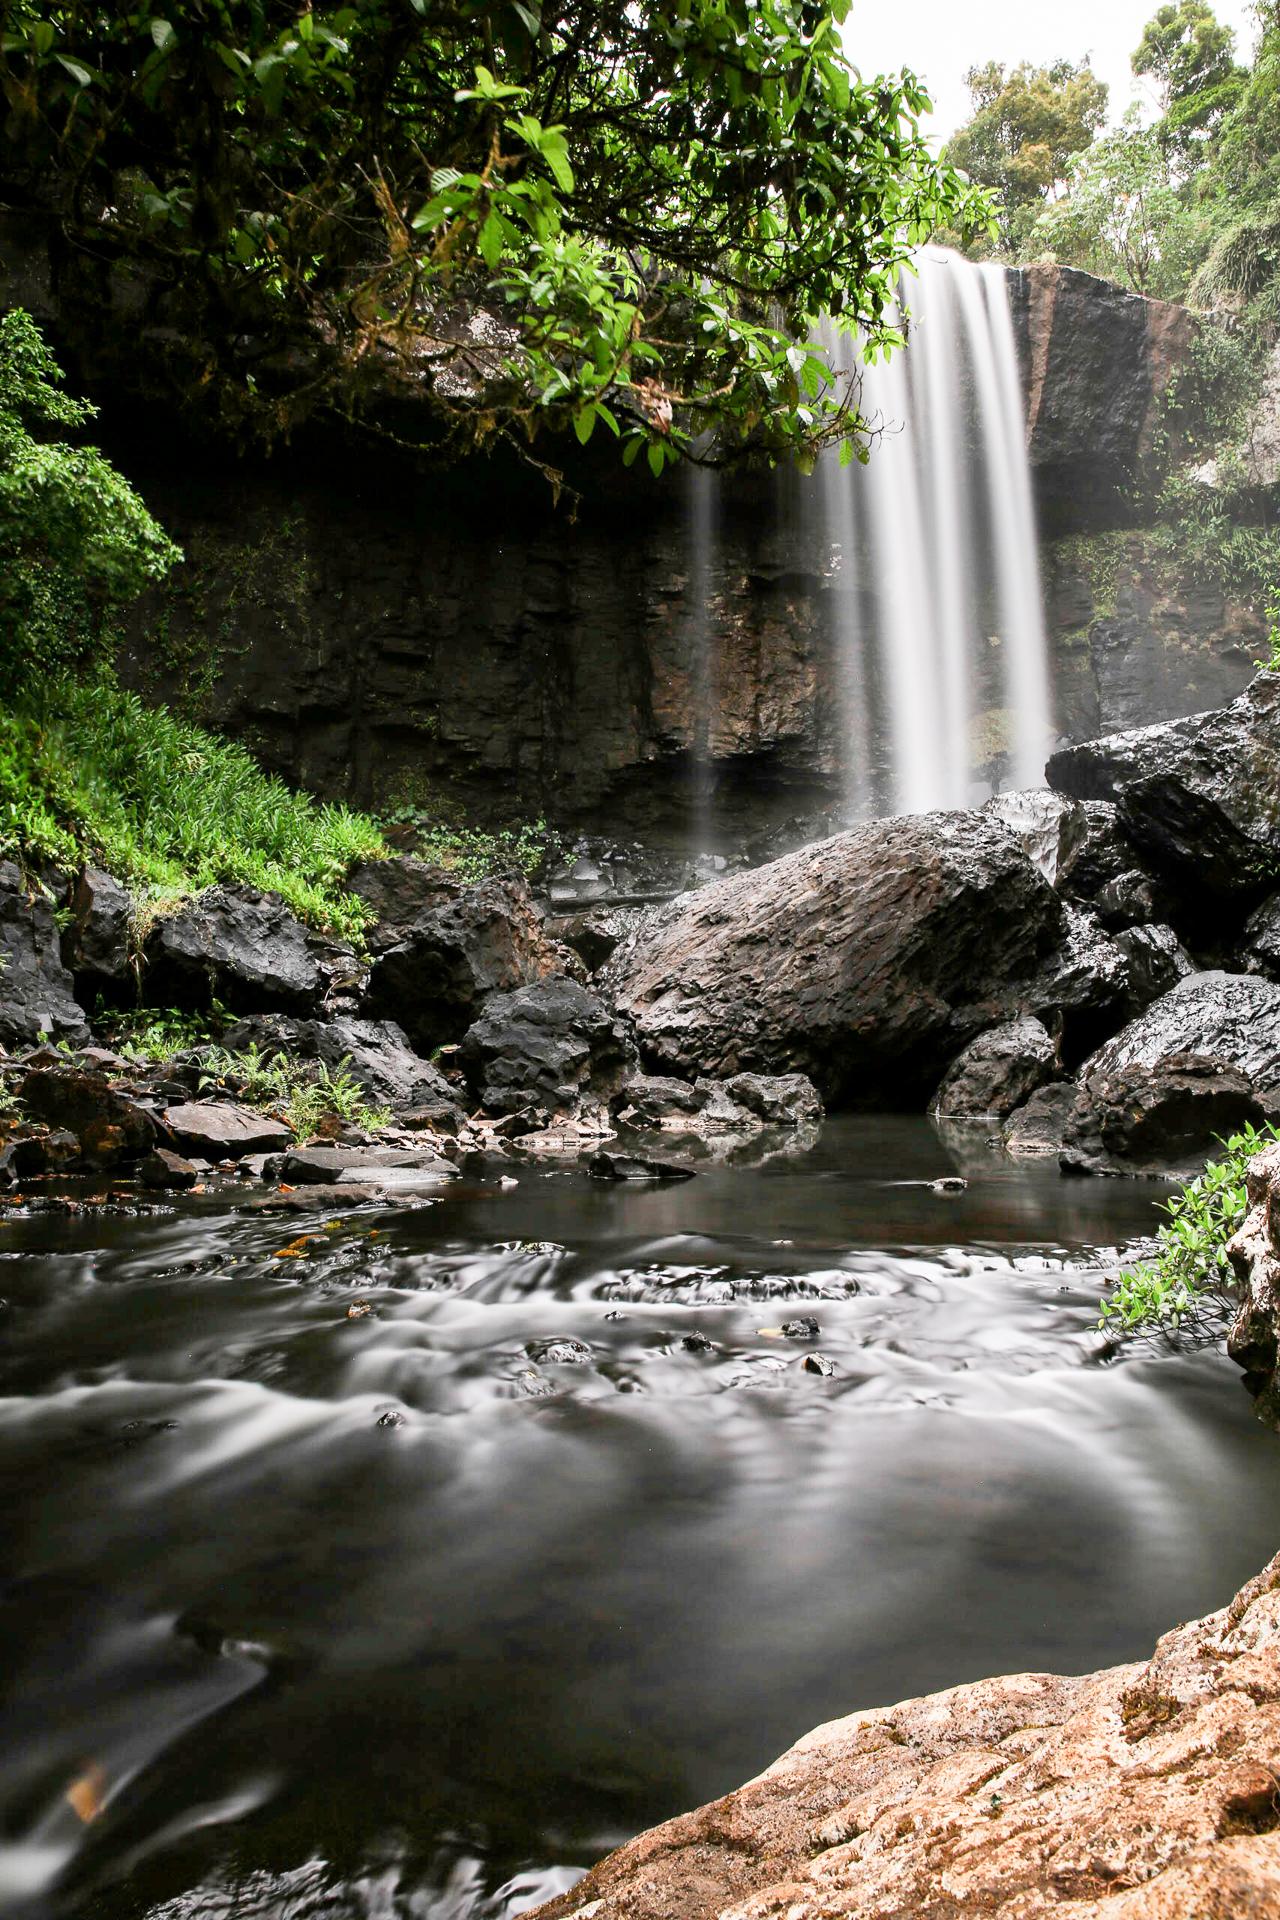 Bild: Wasserfall Atherton Tablelands Australien